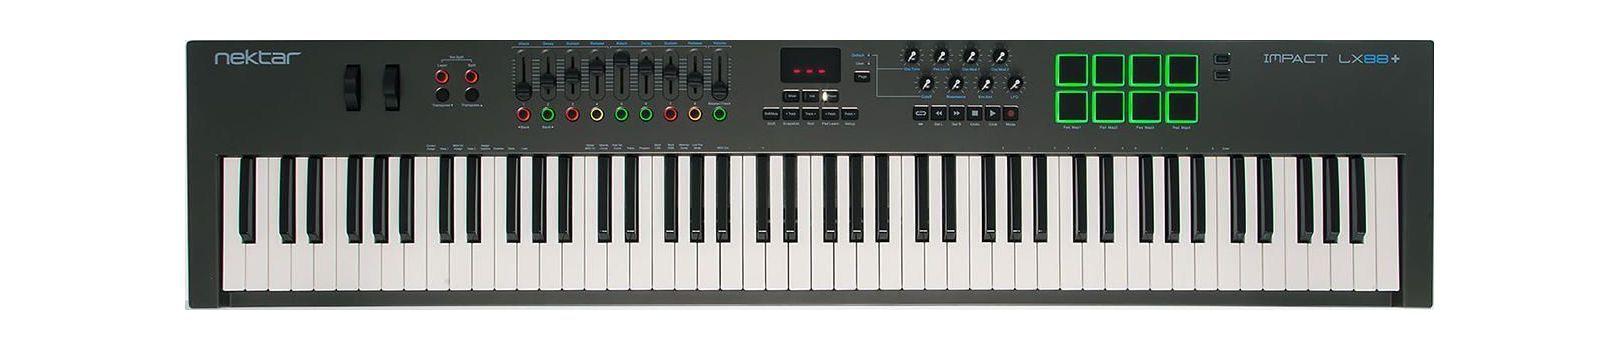 Claviatura MIDI Nektar Impact LX88+